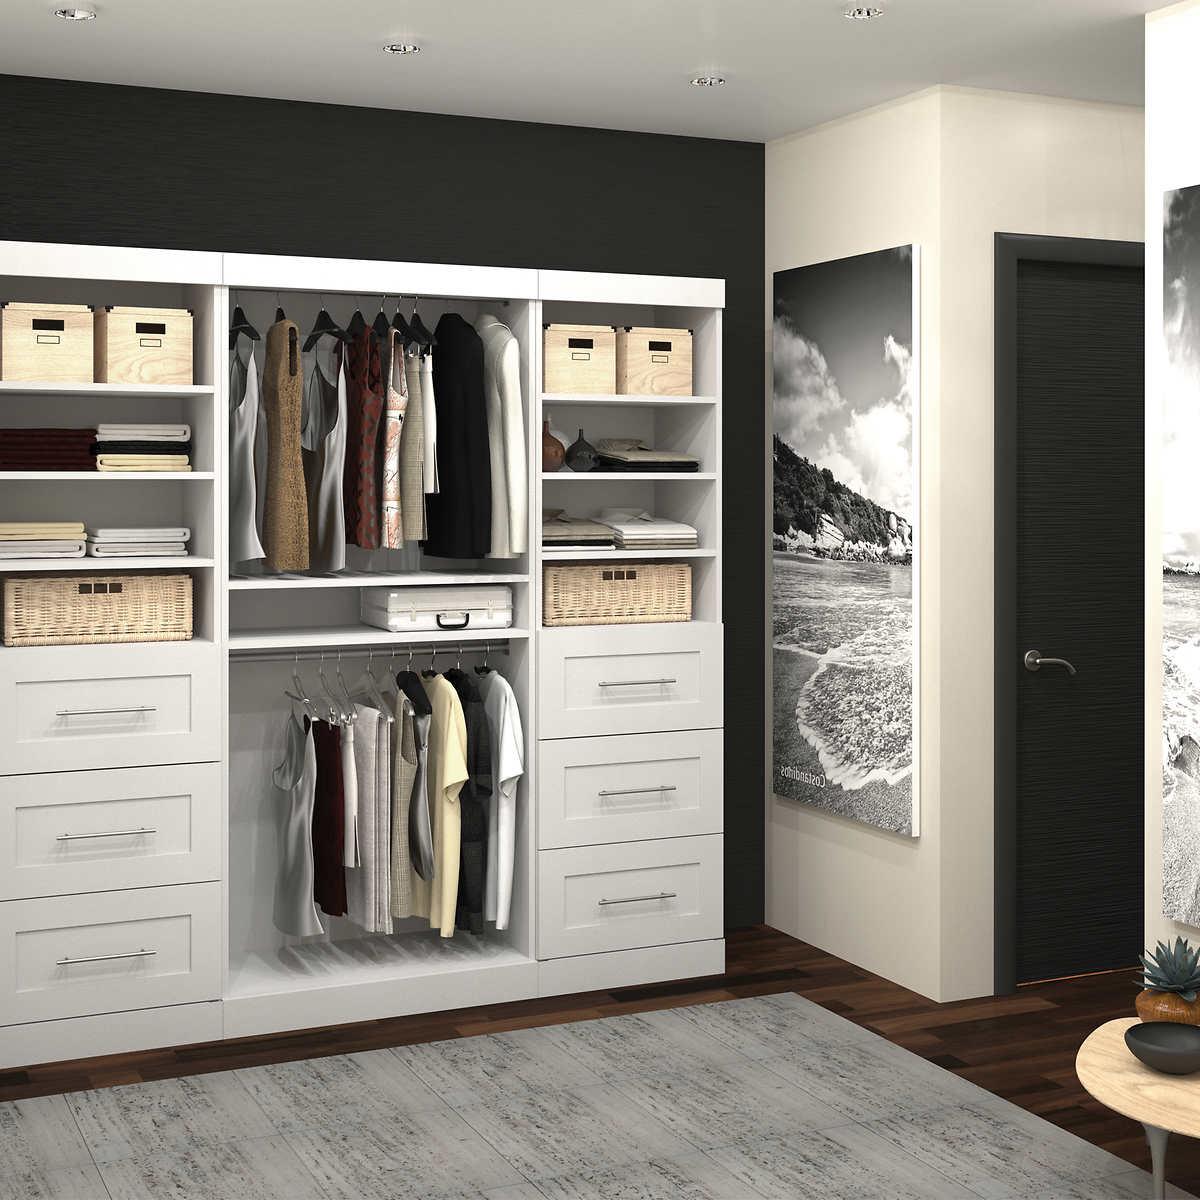 Closet Organizer Service storage cabinets & shelving units   costco